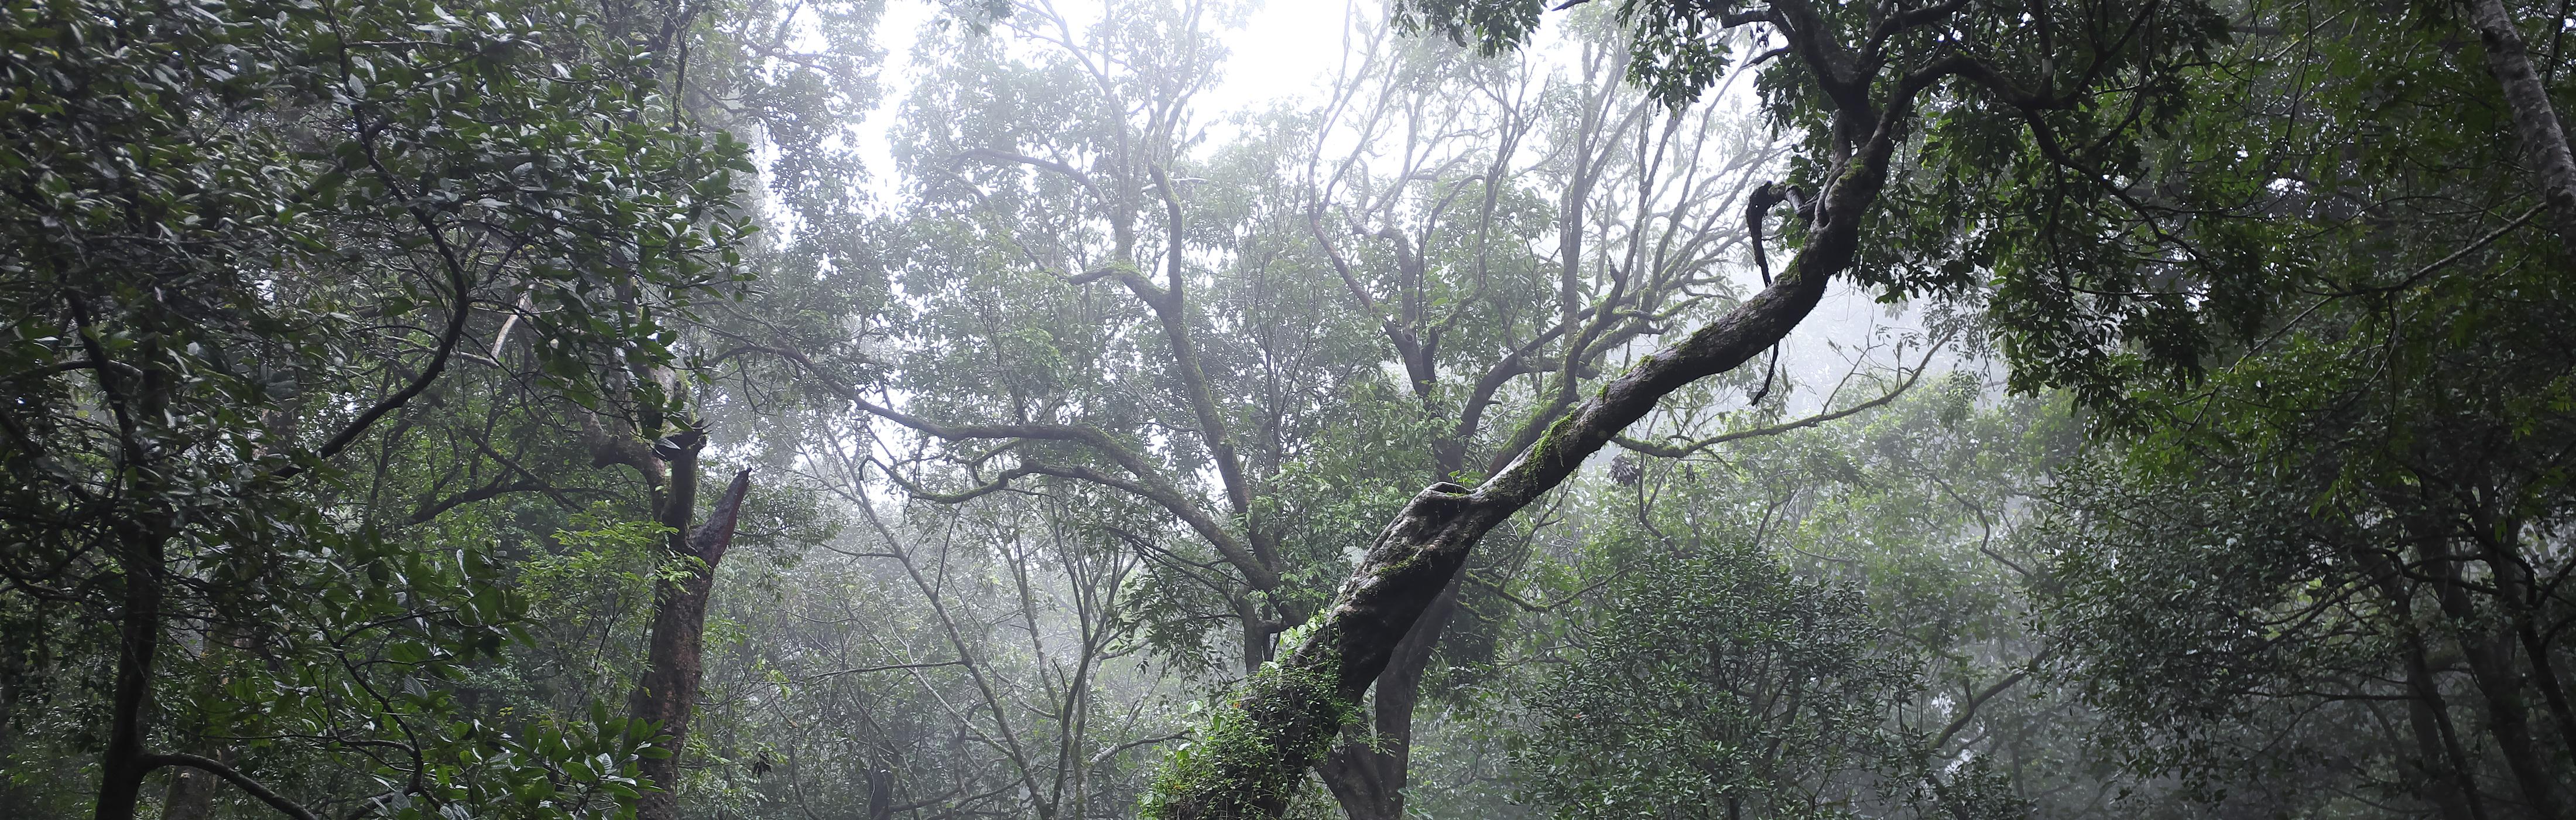 HOW TO ENJOY TERRA BASE PART1 「雲霧林への憧れ」